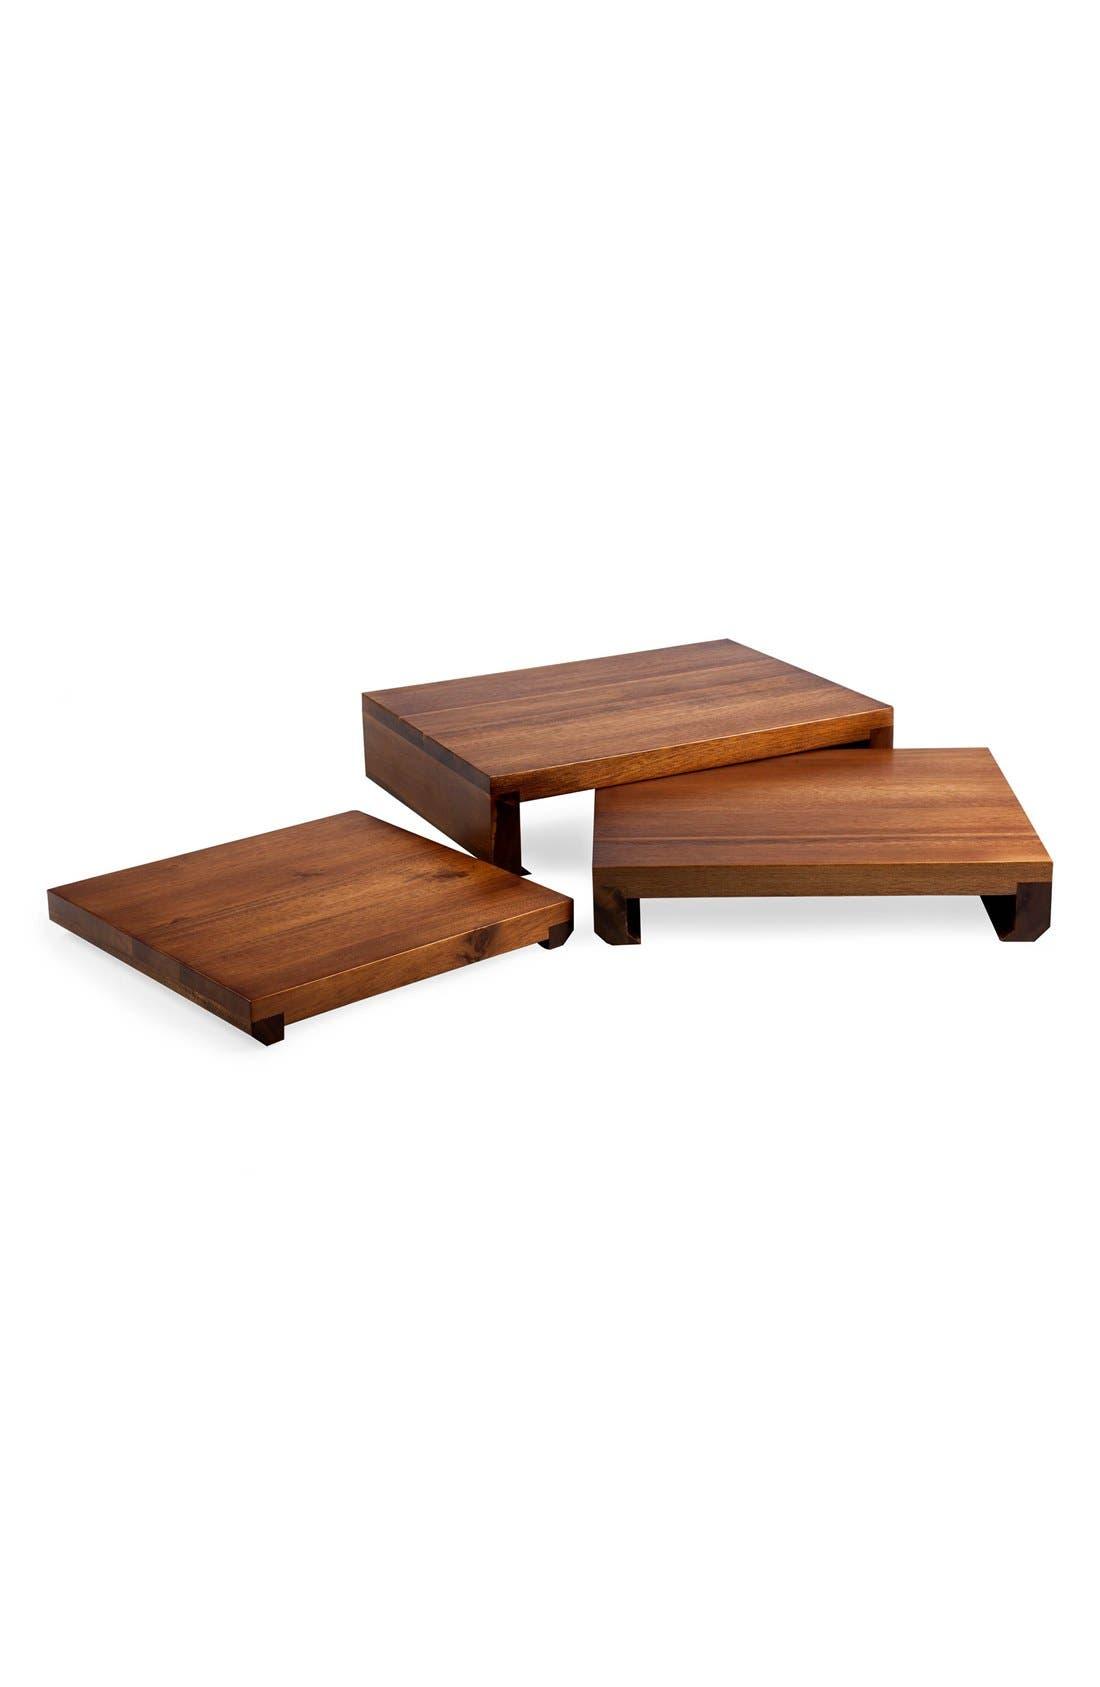 'Etage' Wood Serving Pedestals,                             Alternate thumbnail 2, color,                             BROWN